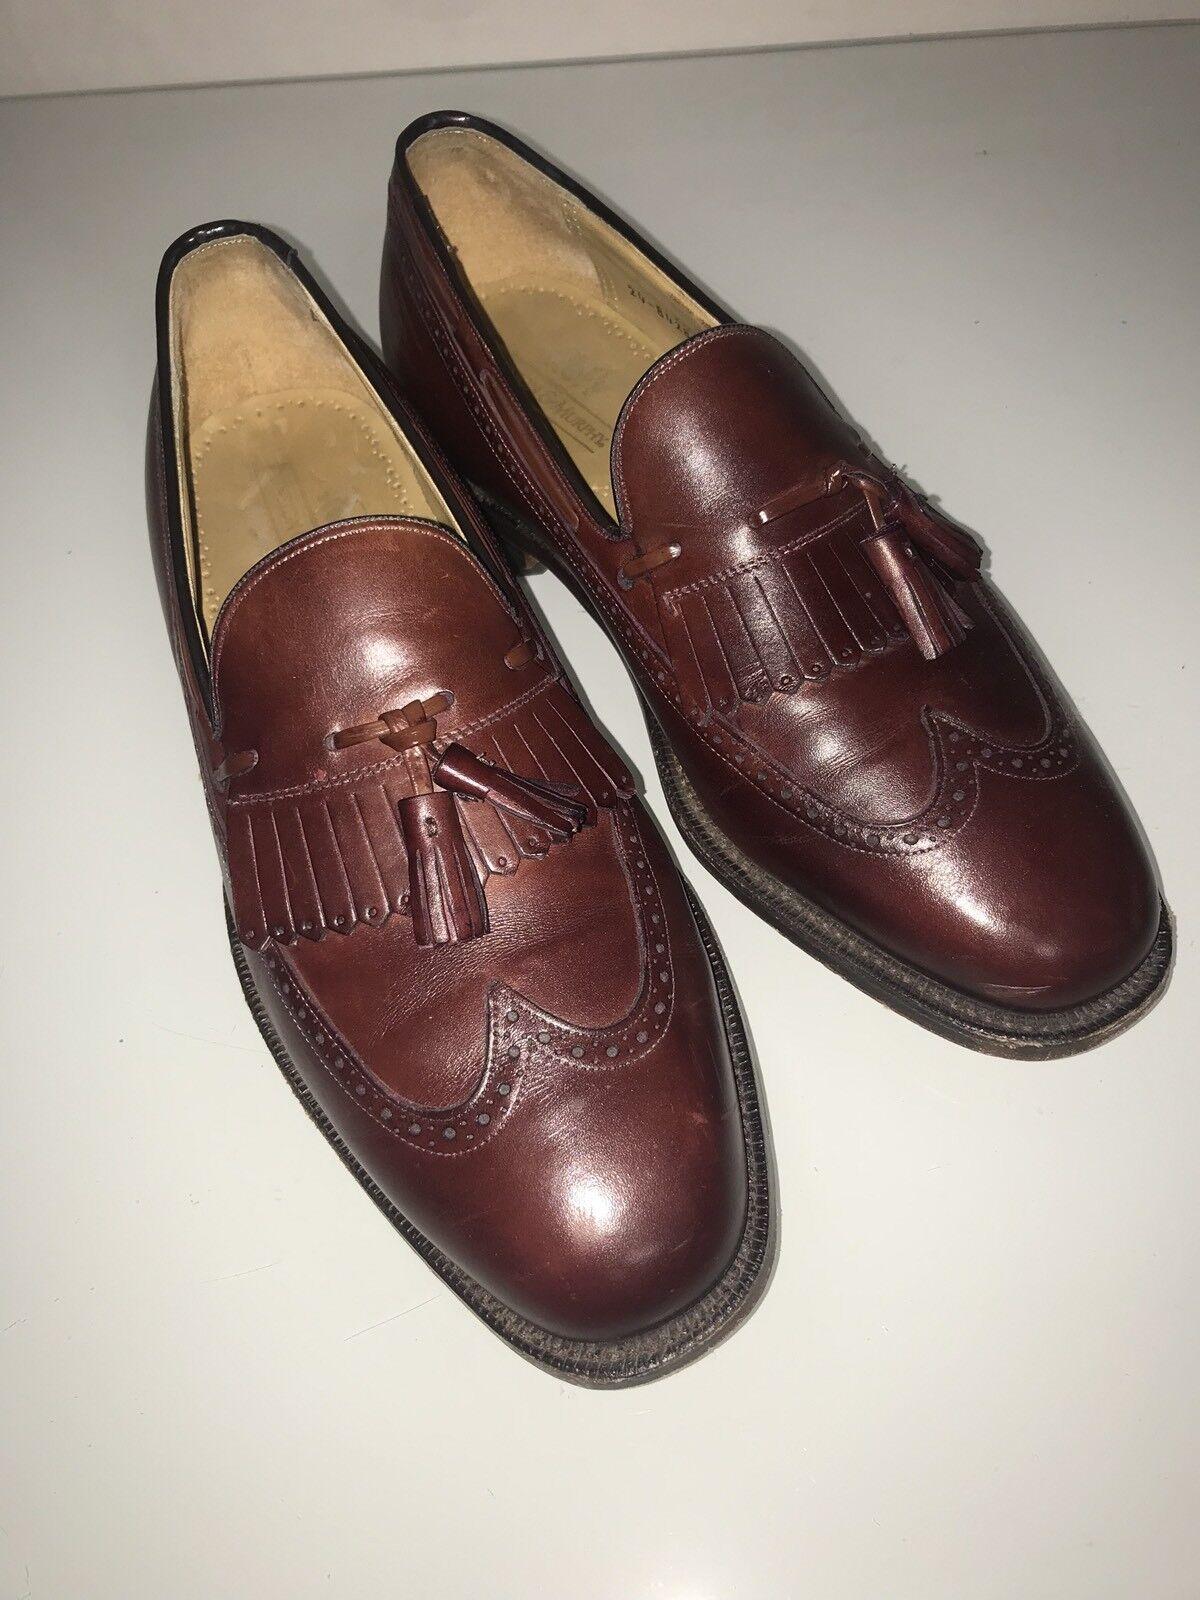 Johnston Murphy Aristocraft Burgundy Pelle Kilt Tassel Loafers Shoe 9.5 D/B